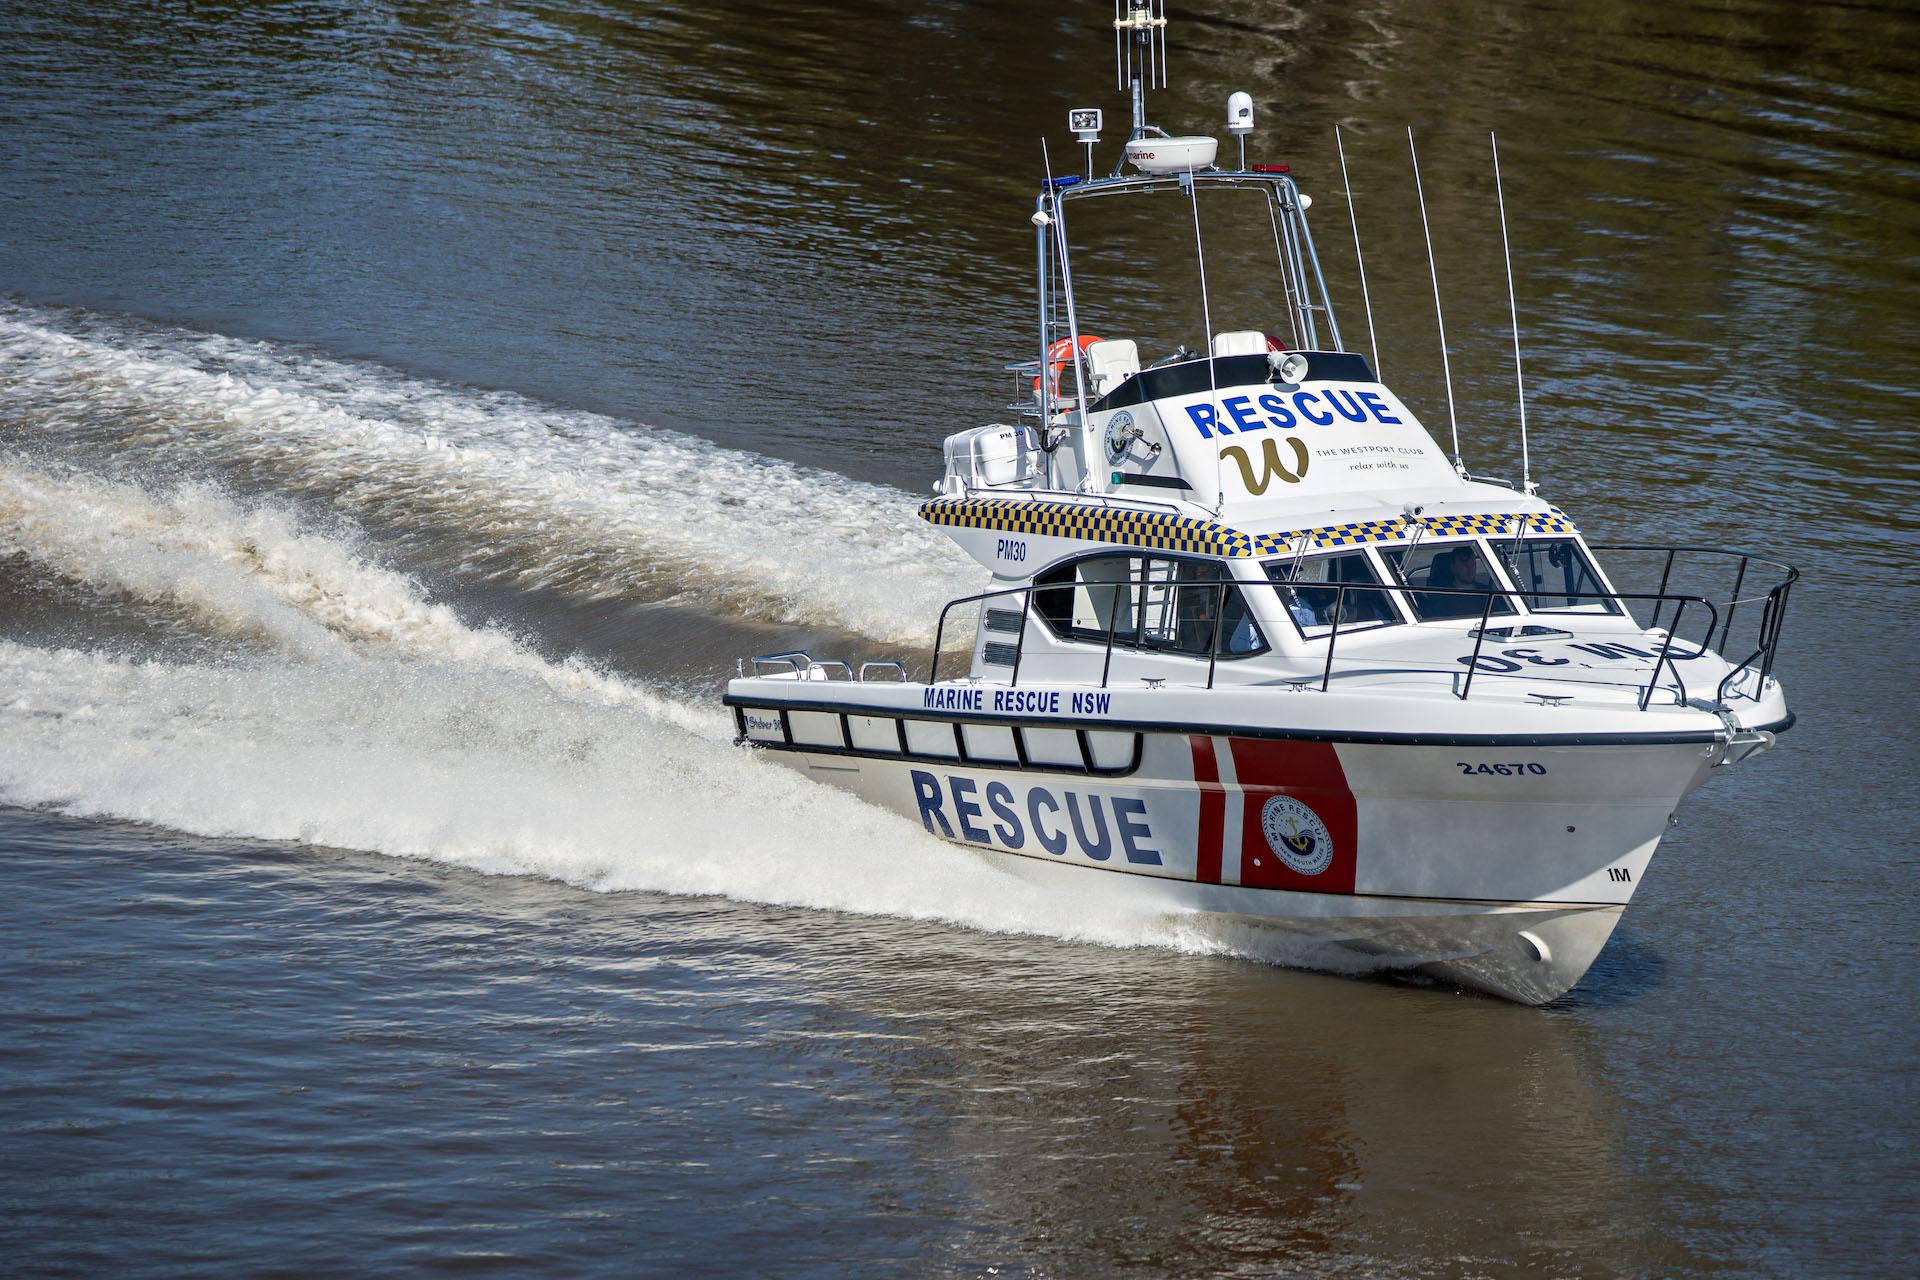 Steber 38 ft SLR Marine Rescue - Port Macquarie, NSW